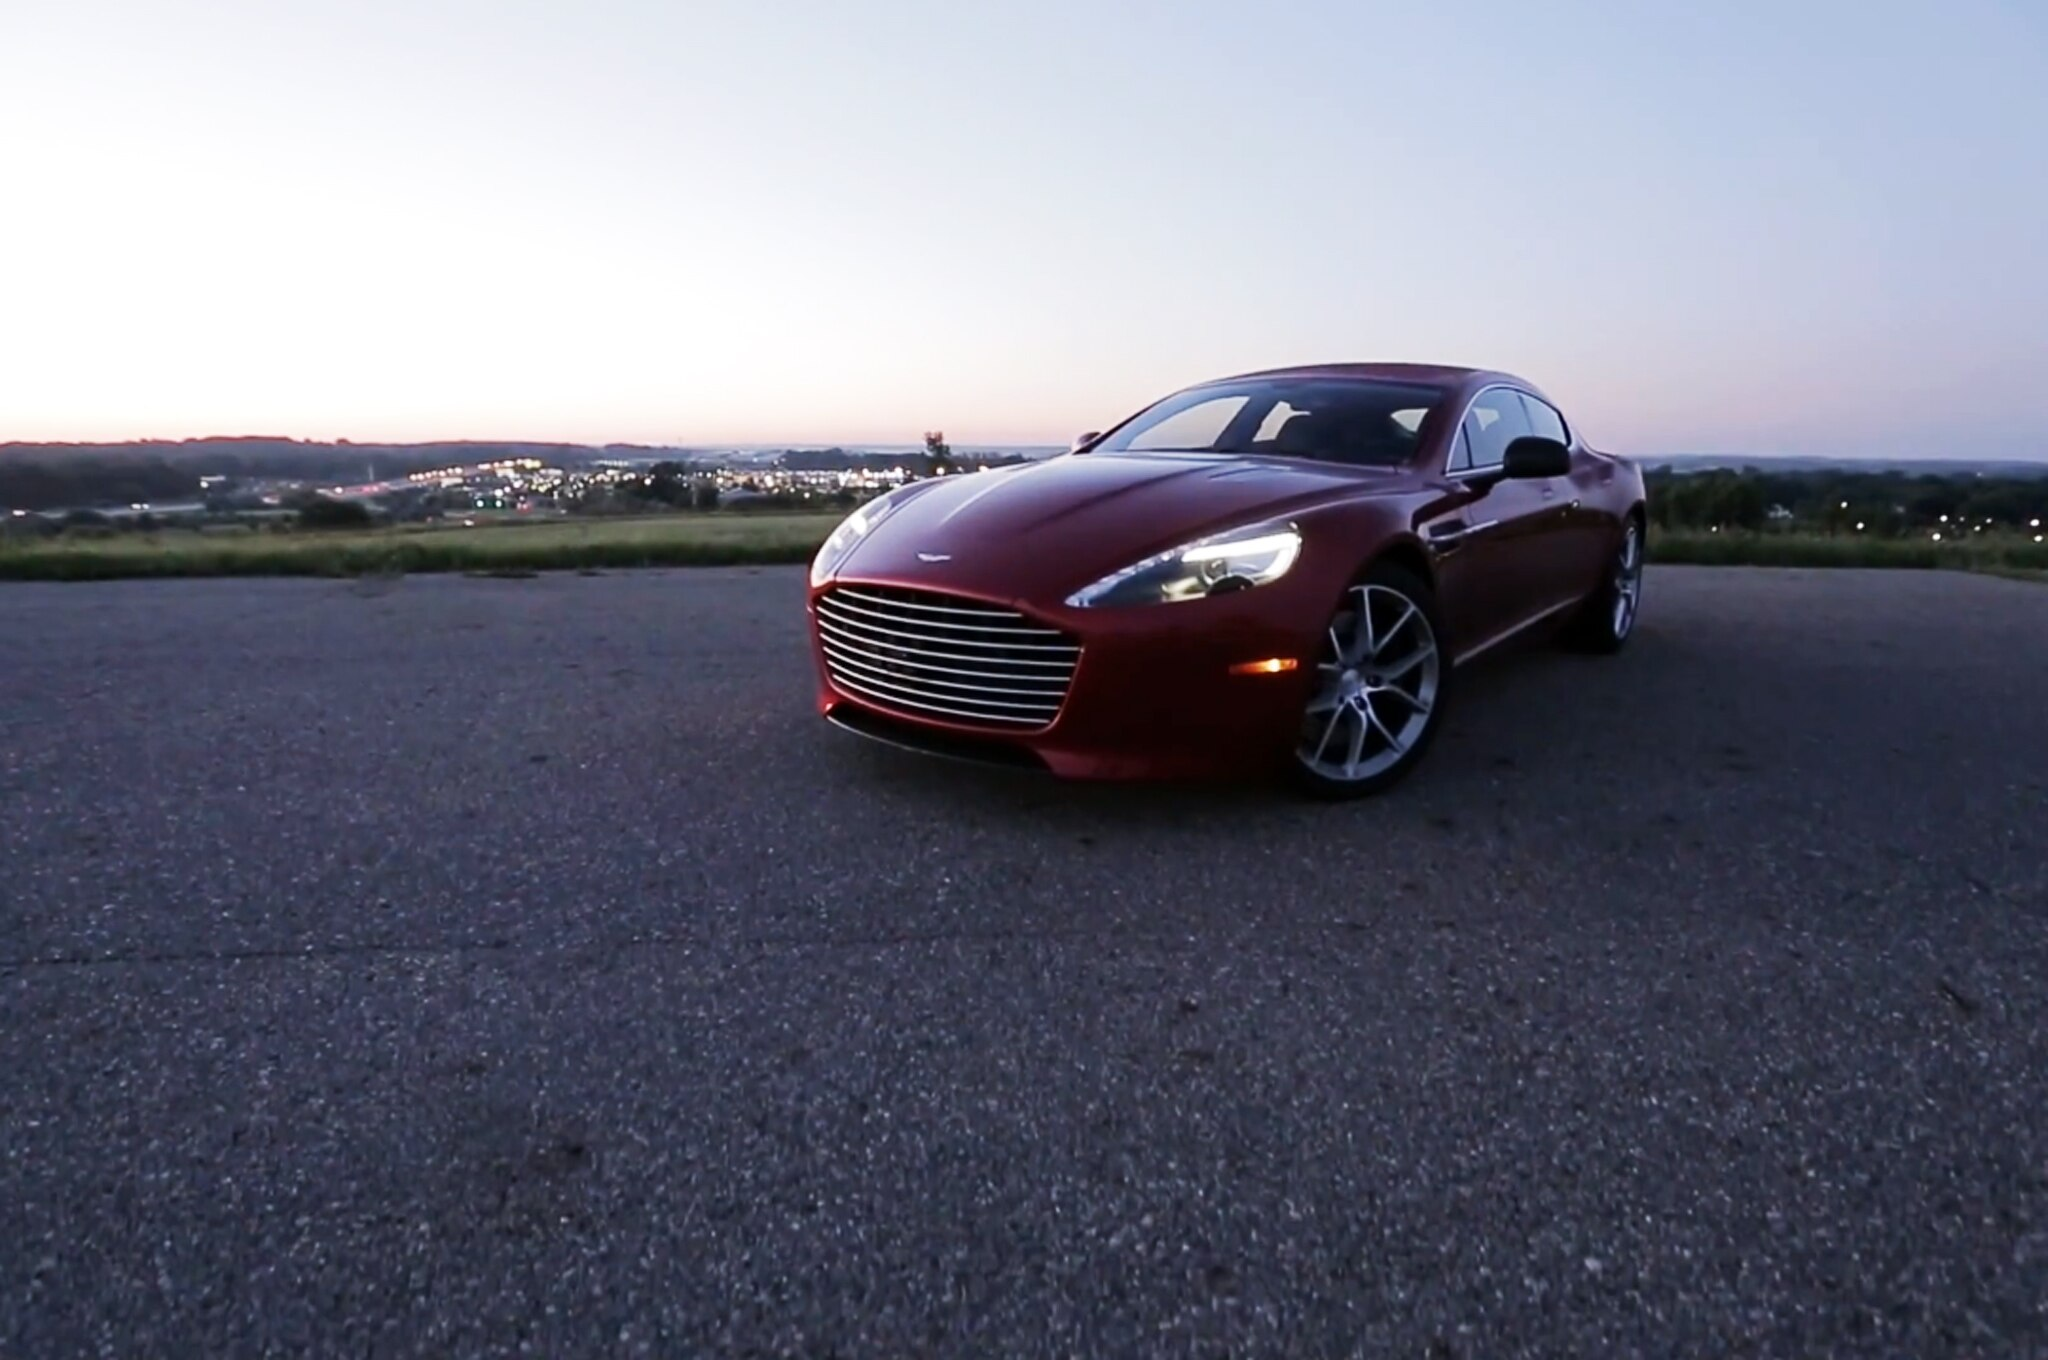 2014 Aston Martin Rapide S Carporn Video